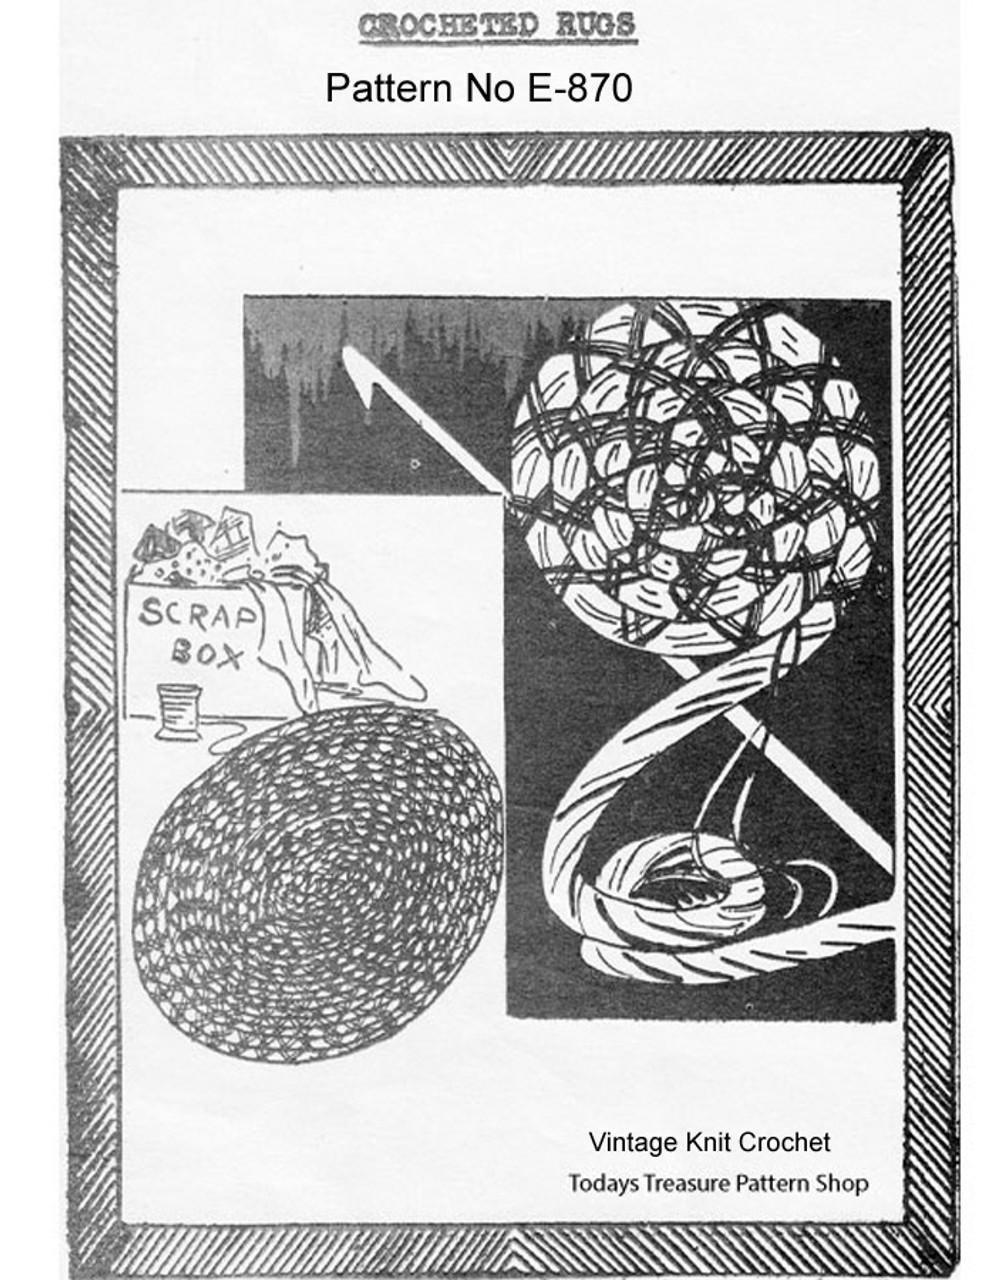 Vintage Crochet Rag Rug Pattern, Martha Madison 870